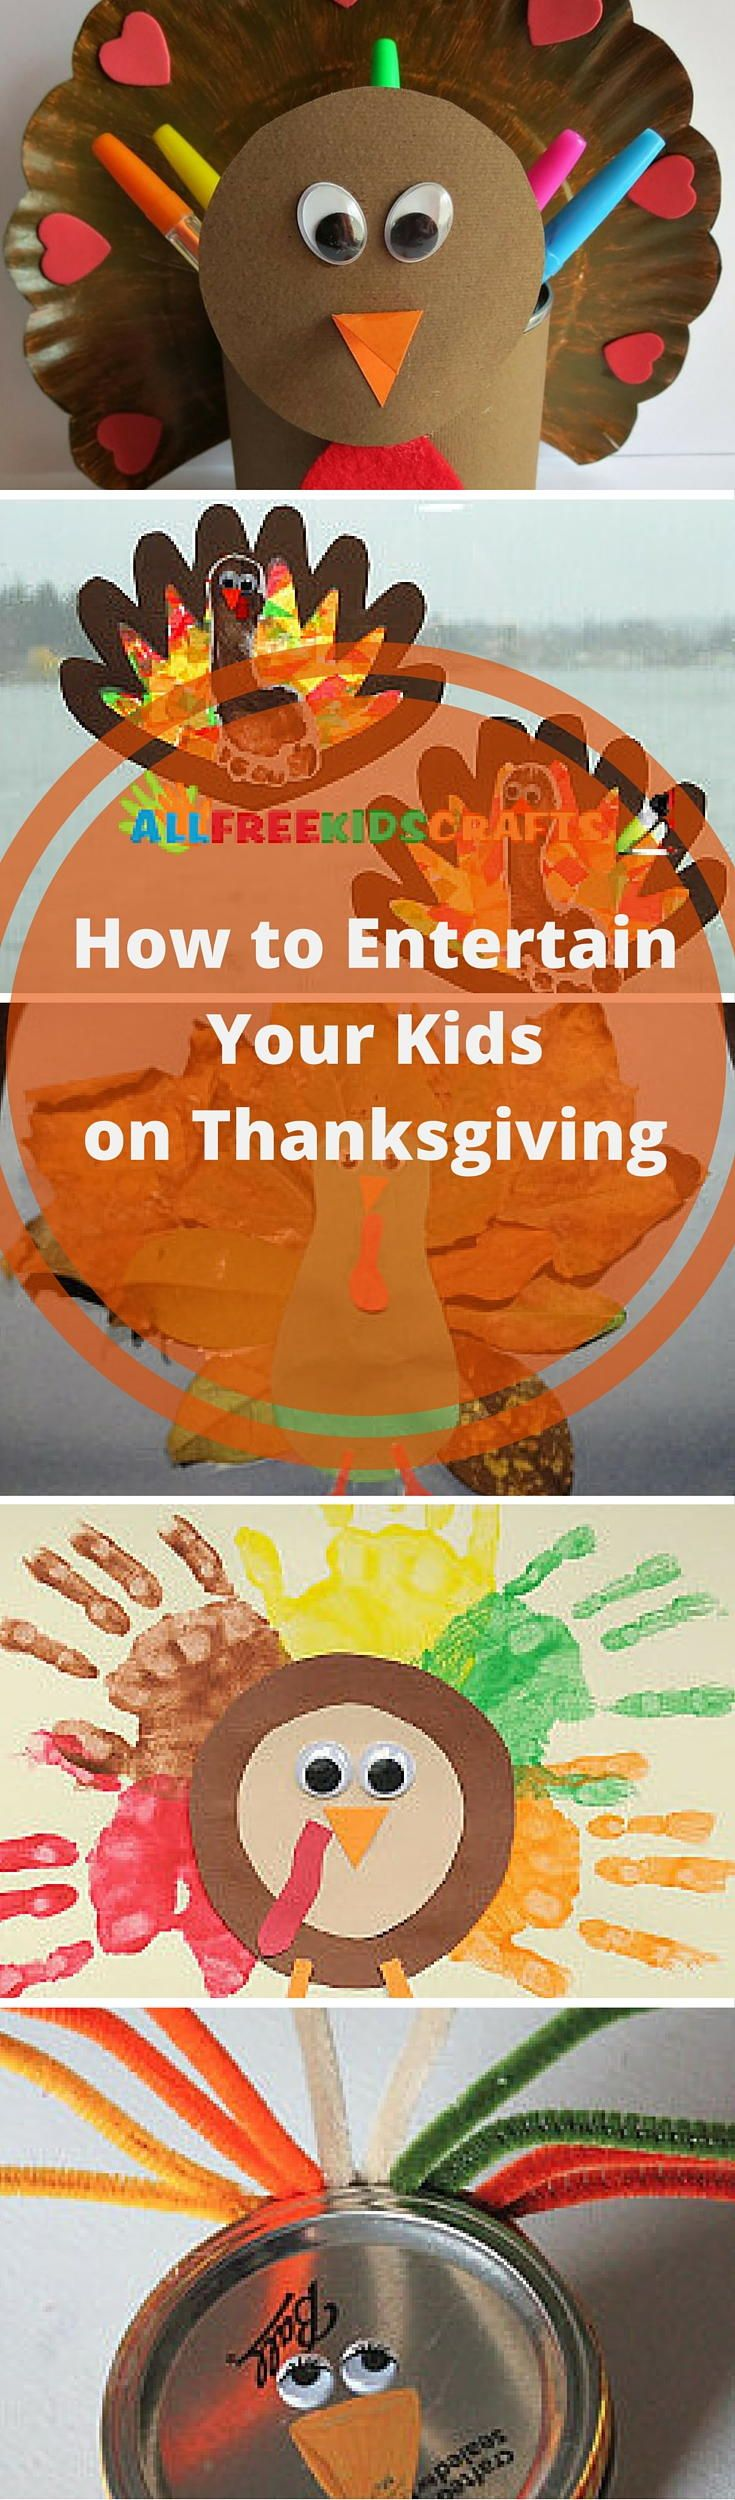 How to Entertain Your Kids on Thanksgiving | AllFreeKidsCrafts.com